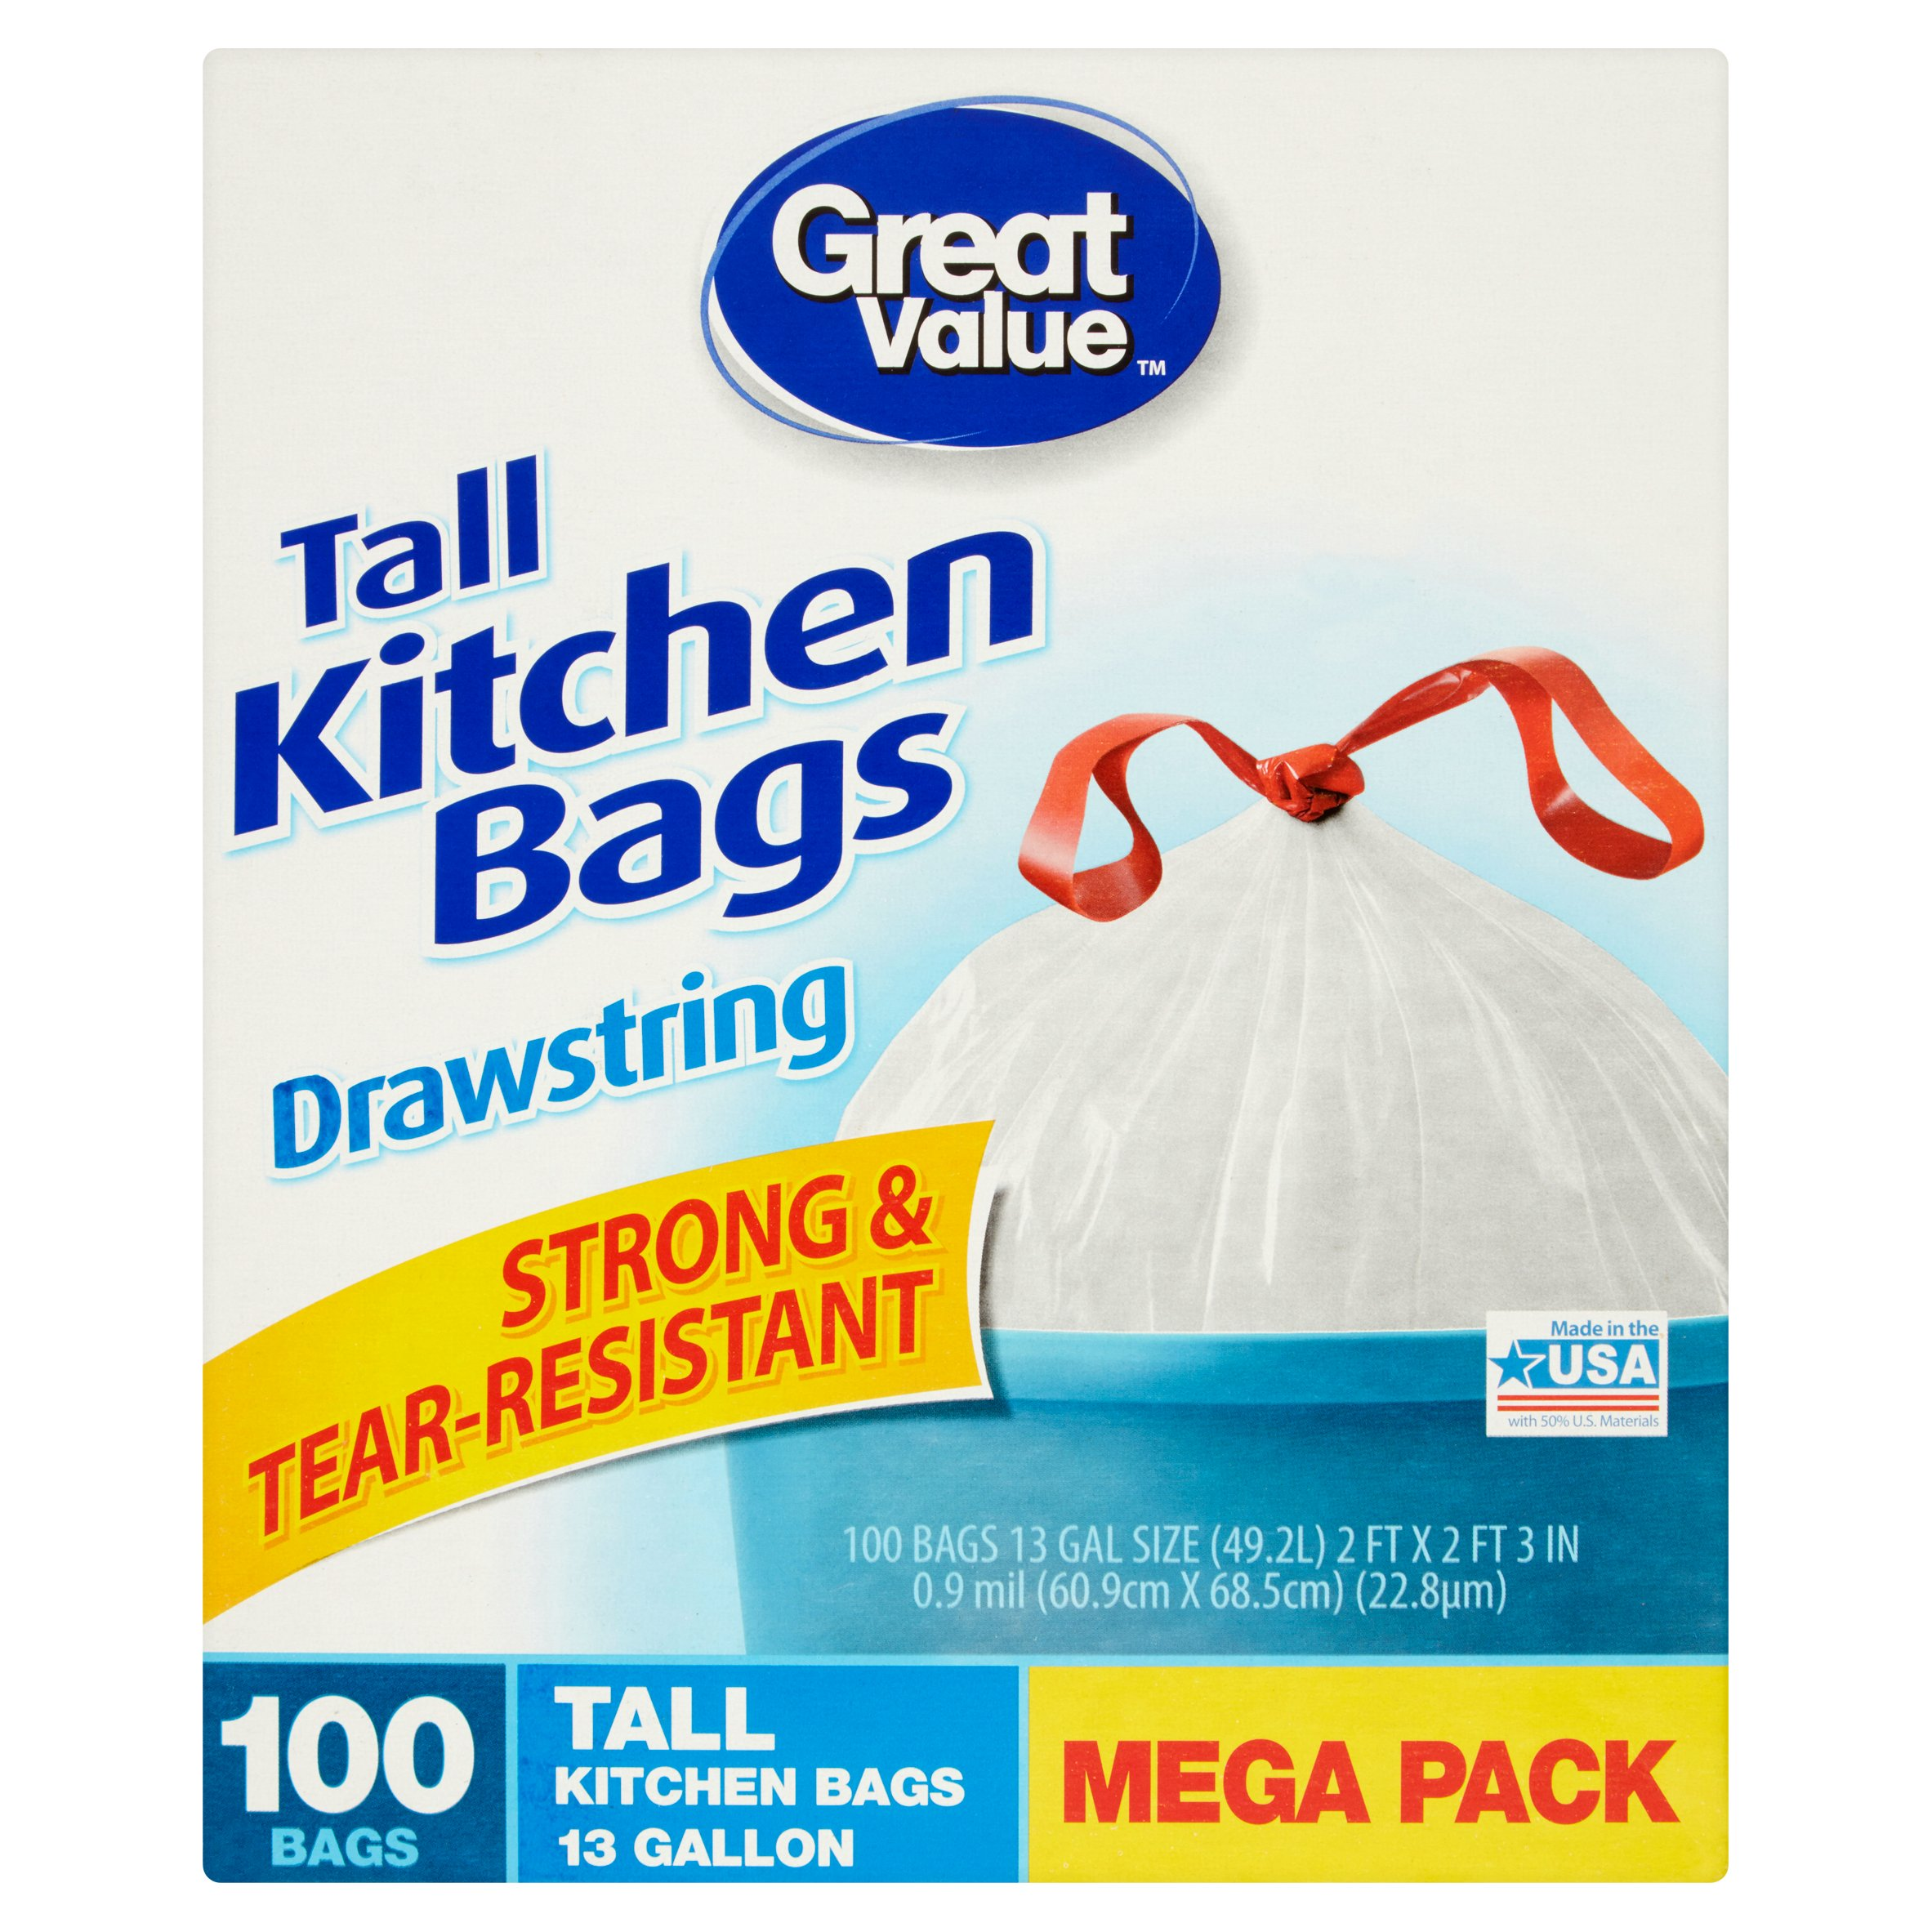 great value tall kitchen bags 13 gallon drawstring mega pack 100